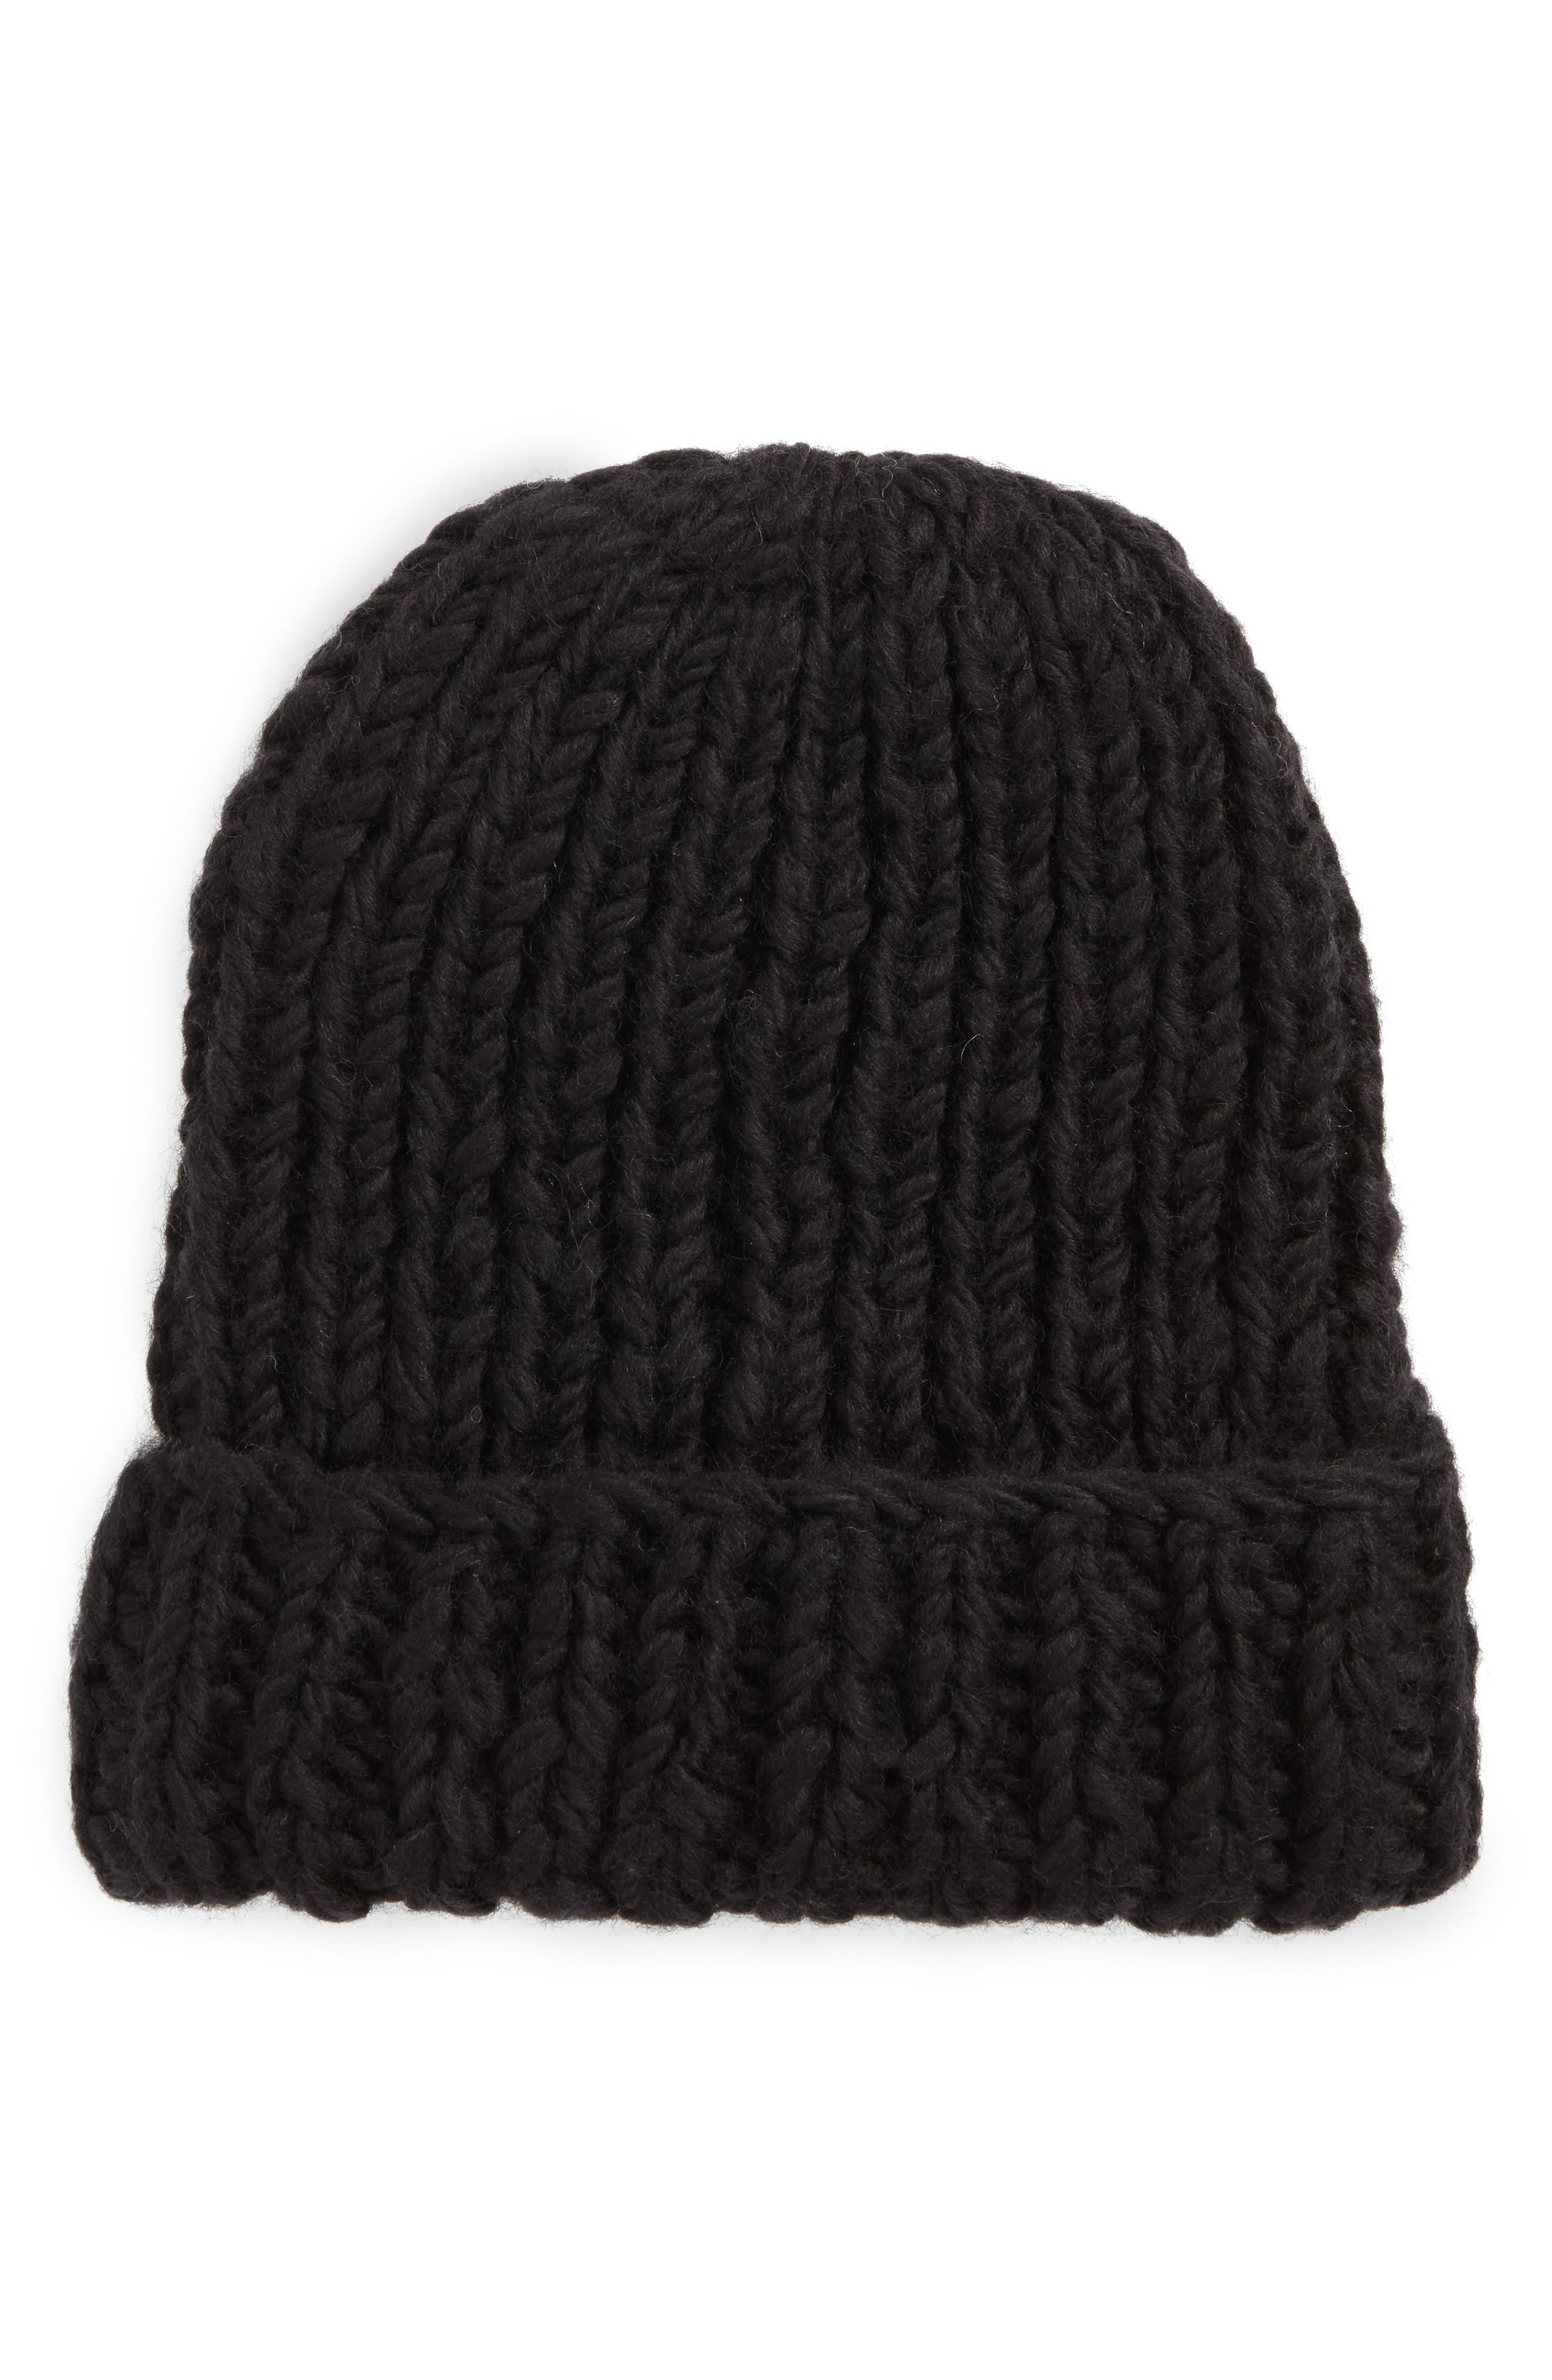 Nirvanna Designs Chunky Knit Slouchy Wool Cap